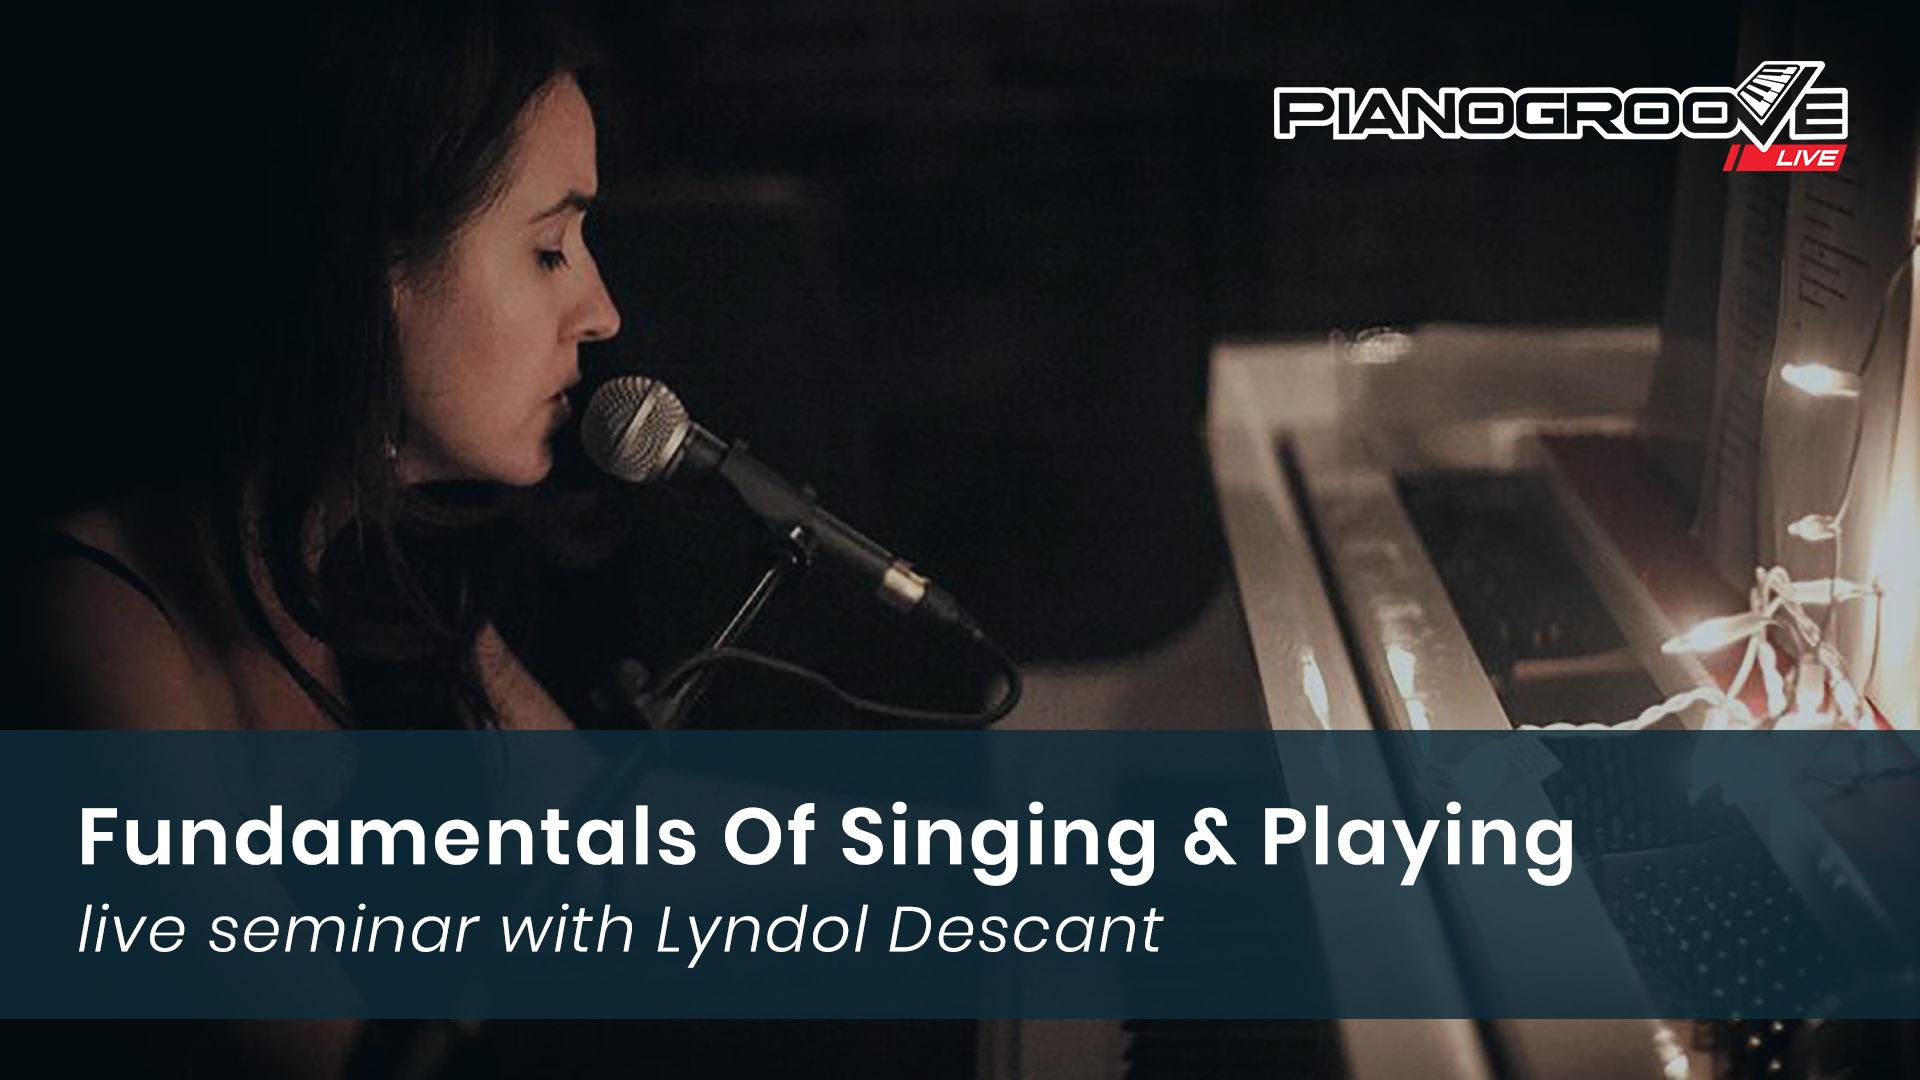 Fundamentals Of Singing & Playing